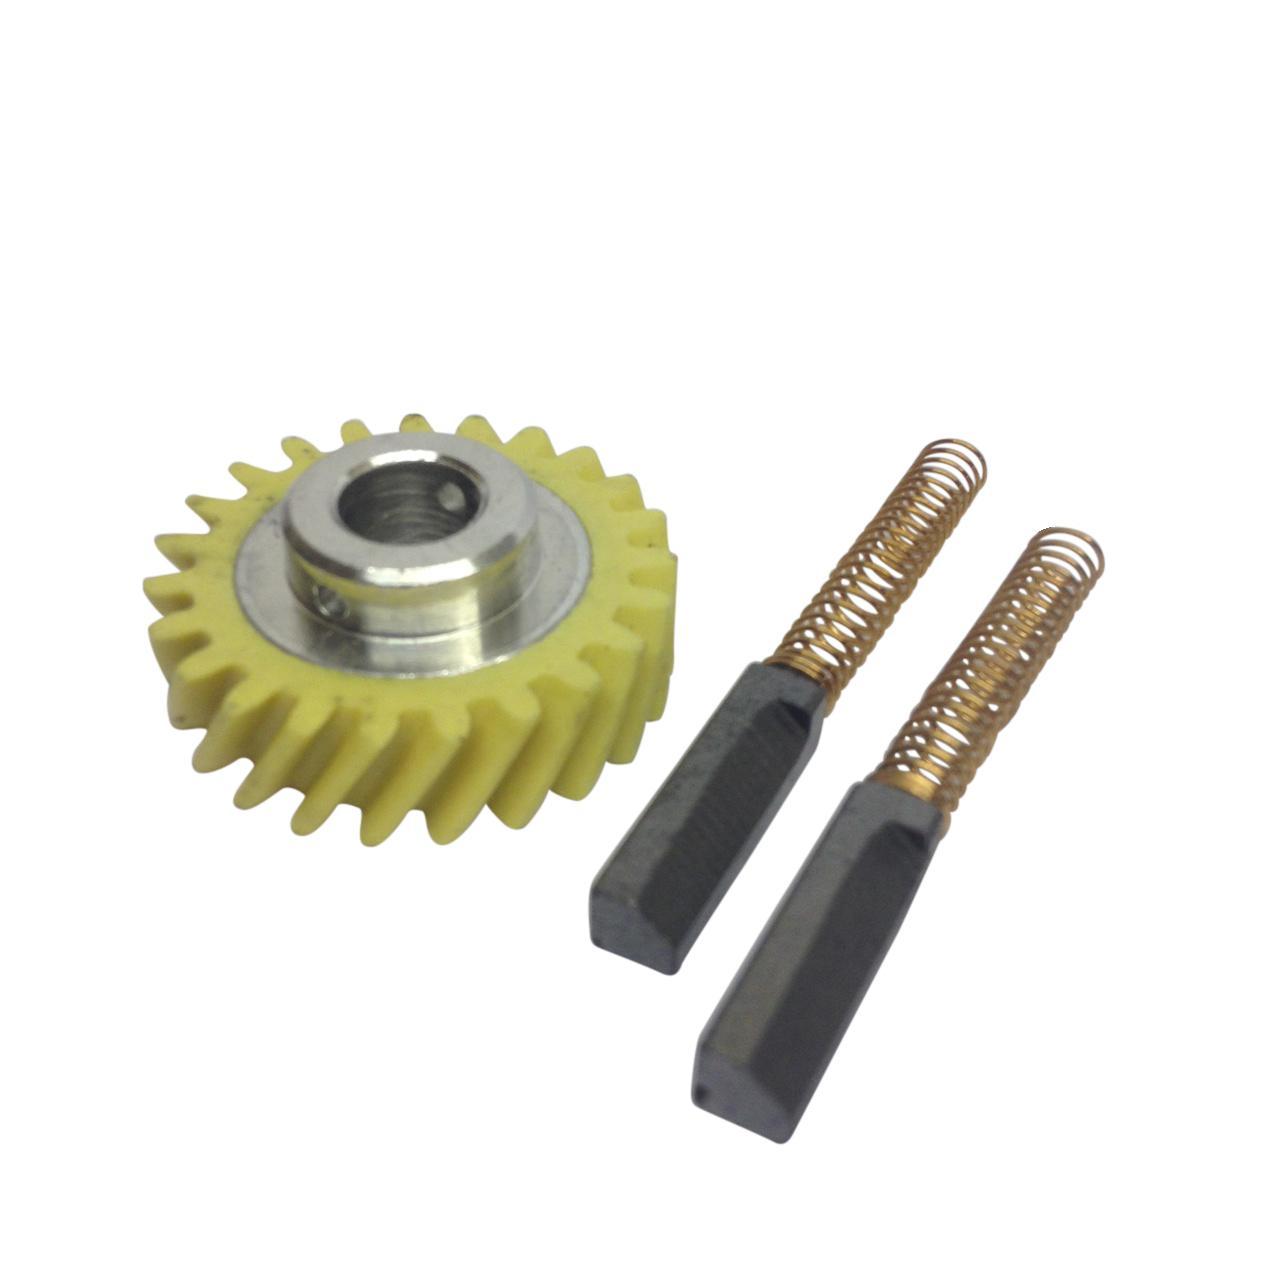 Kitchenaid Stand Mixer Worm Drive Gear W10112253 Amp A Pair